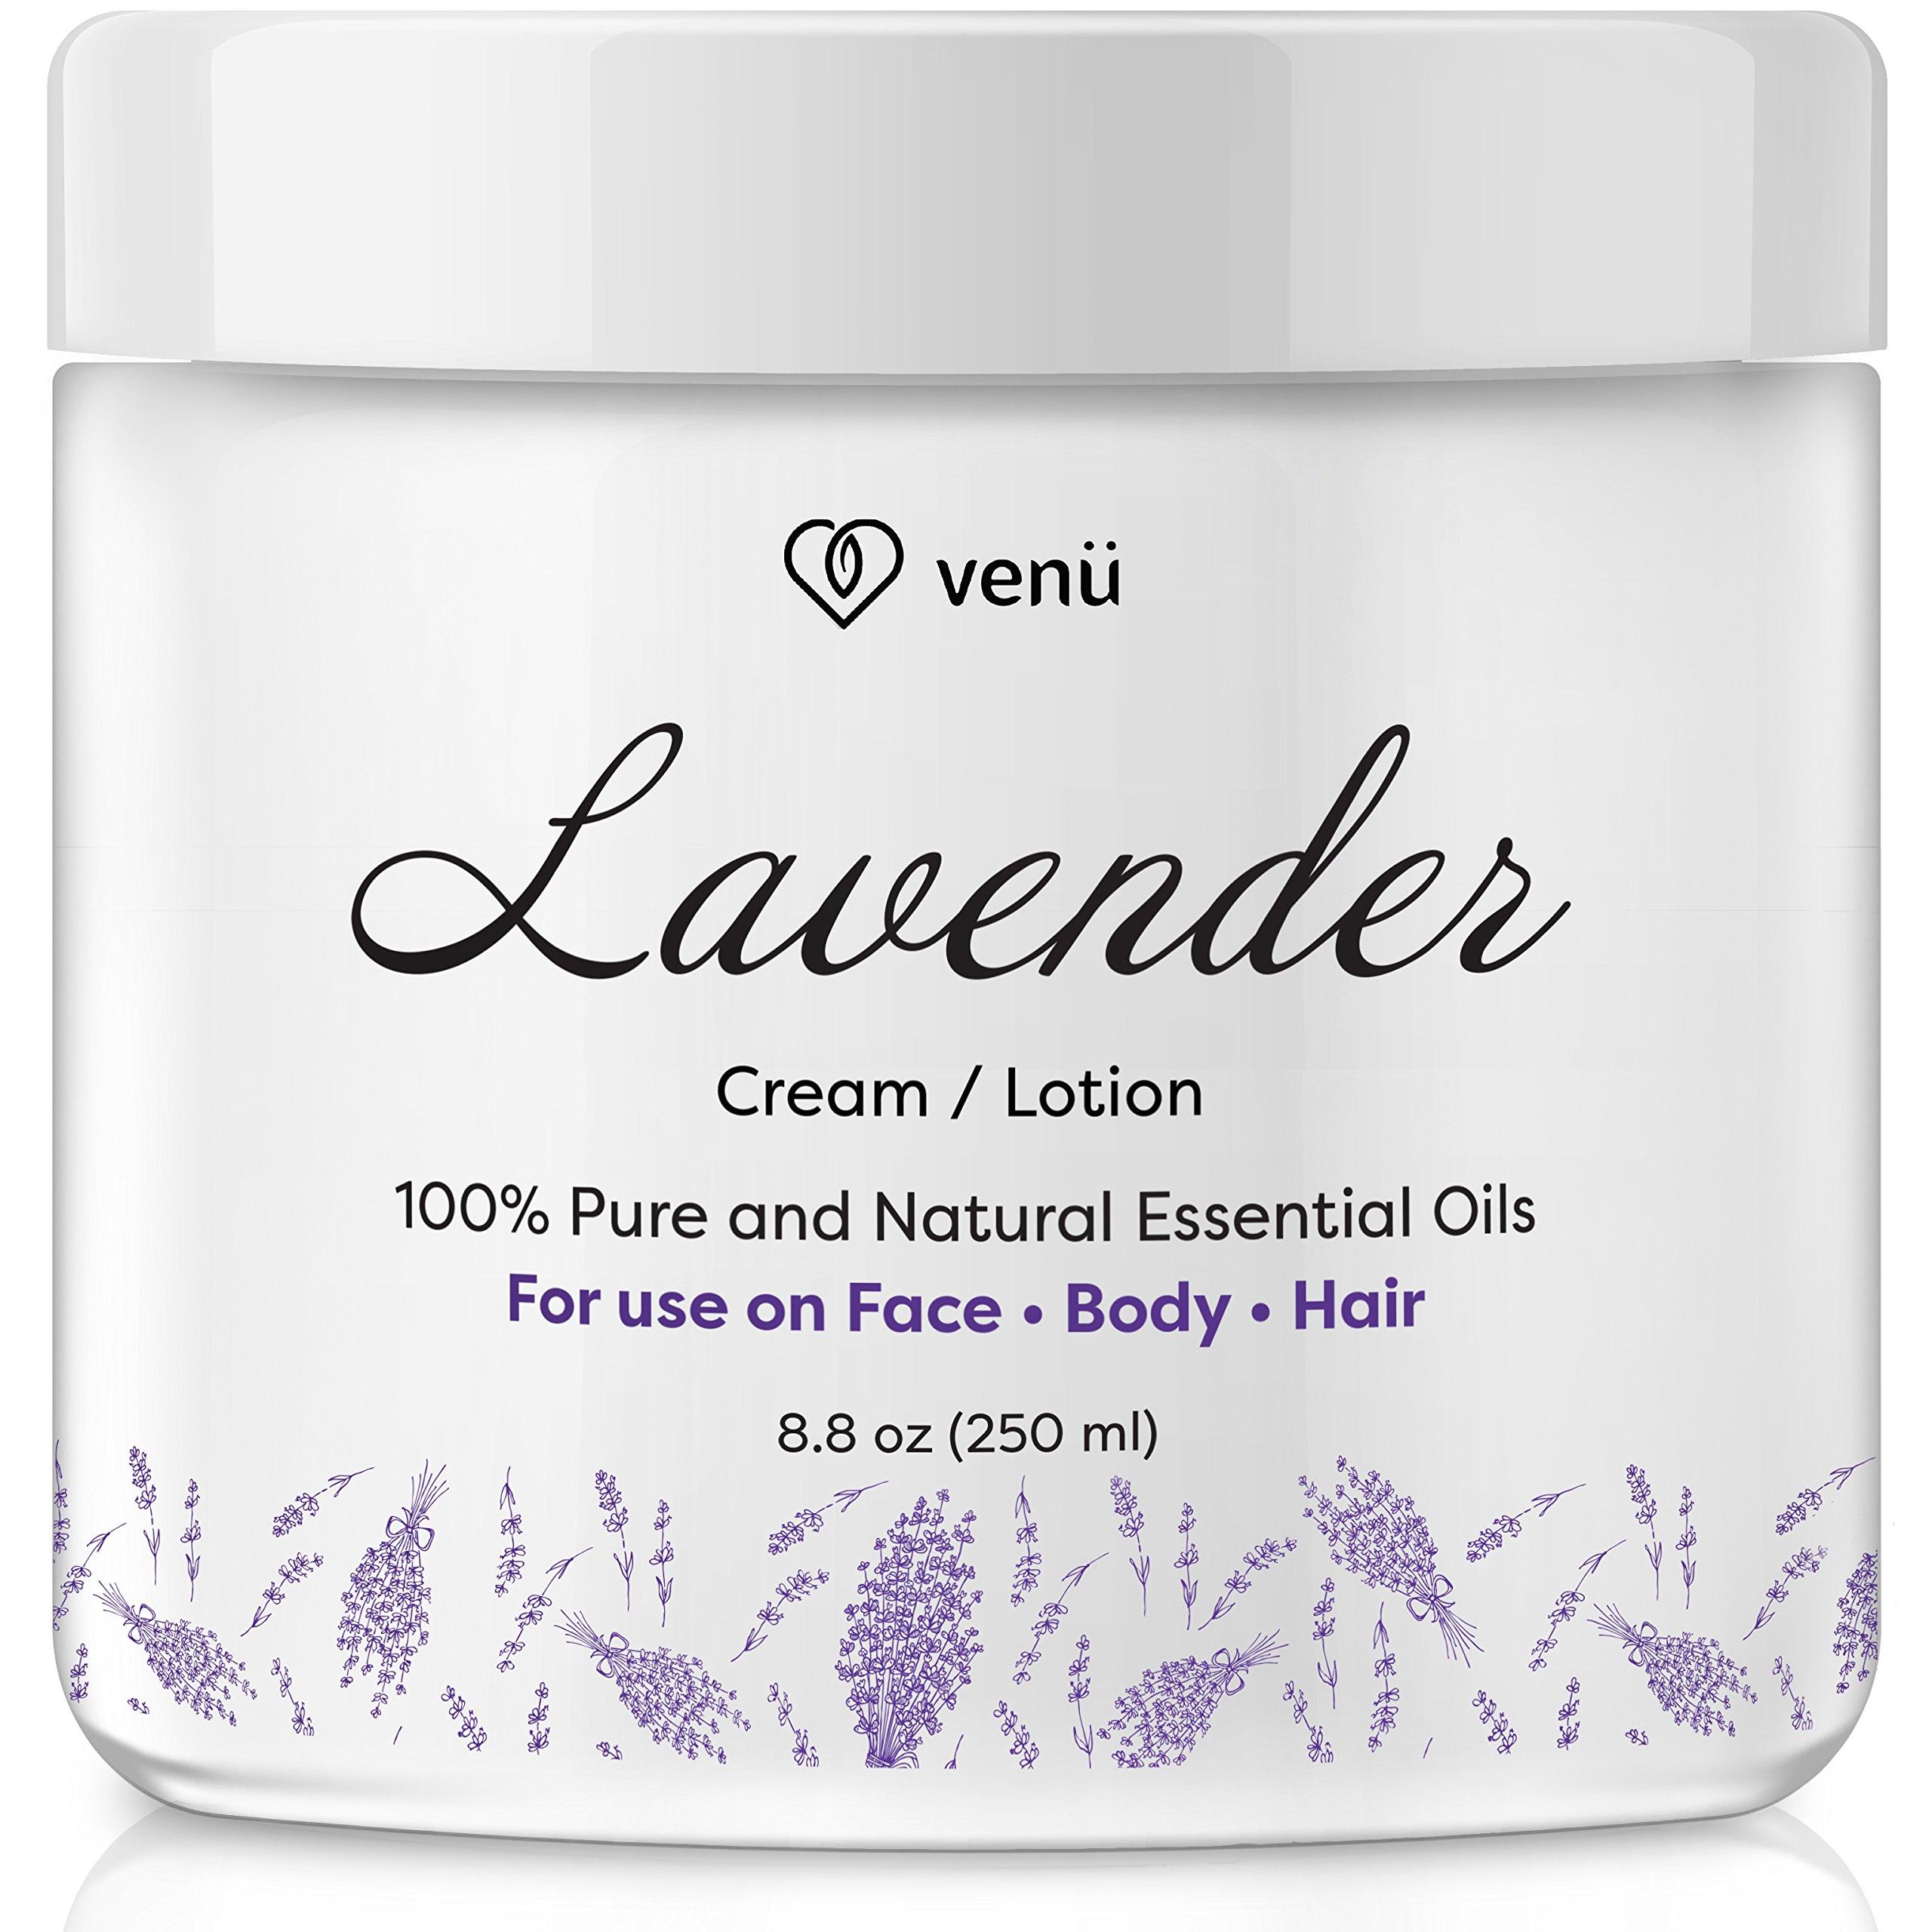 Jojoba Oil Cream Lotion For Dry And Oily Skin Organic Viva Acne 30ml Lavender Essential Daily Moisturizing Face Body Hair All